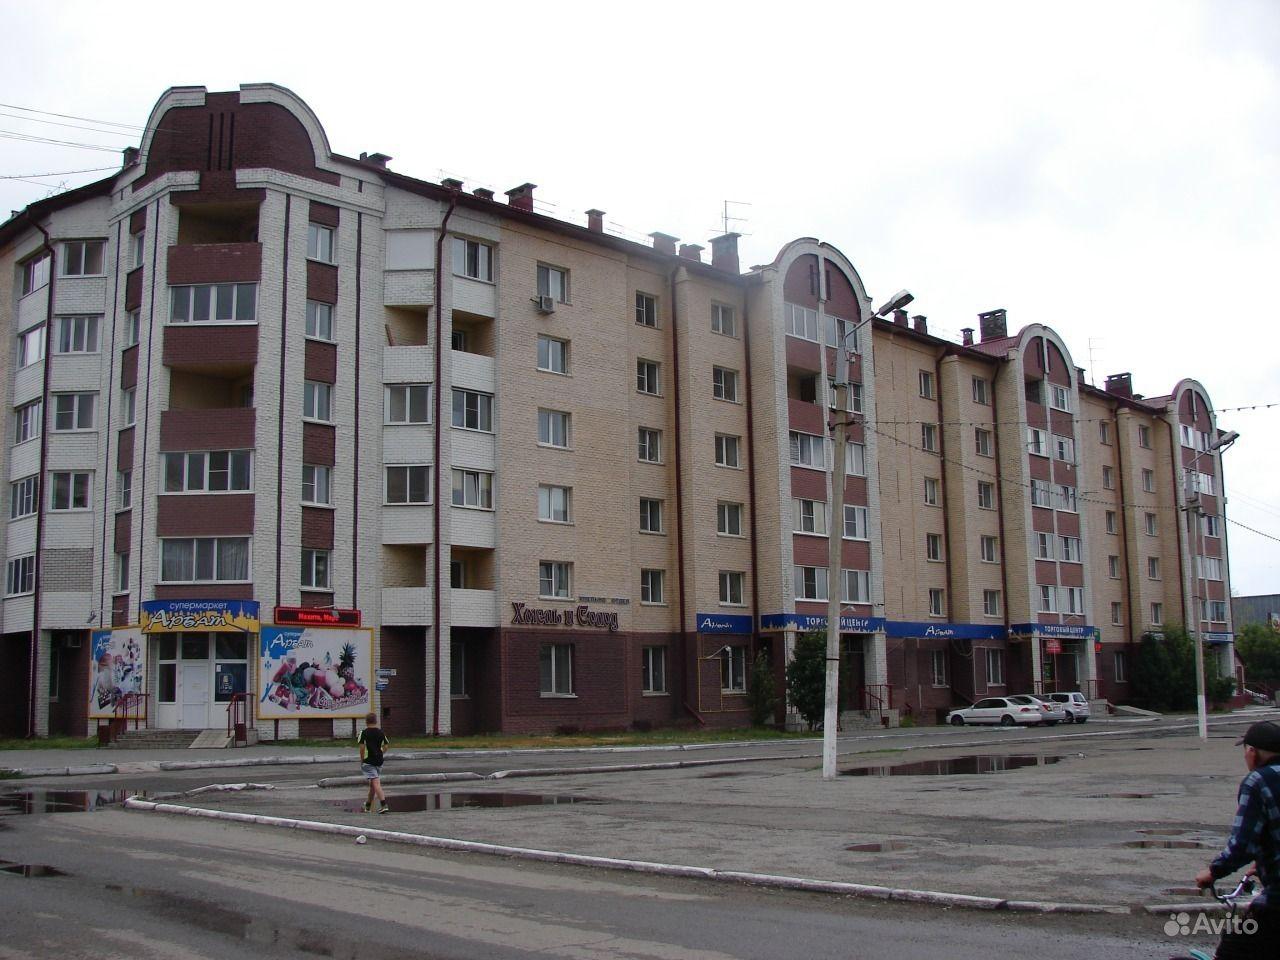 к квартира, 37 м², 4/6 эт. - купить ...: https://www.avito.ru/barnaul/kvartiry/1-k_kvartira_37_m_46_et...